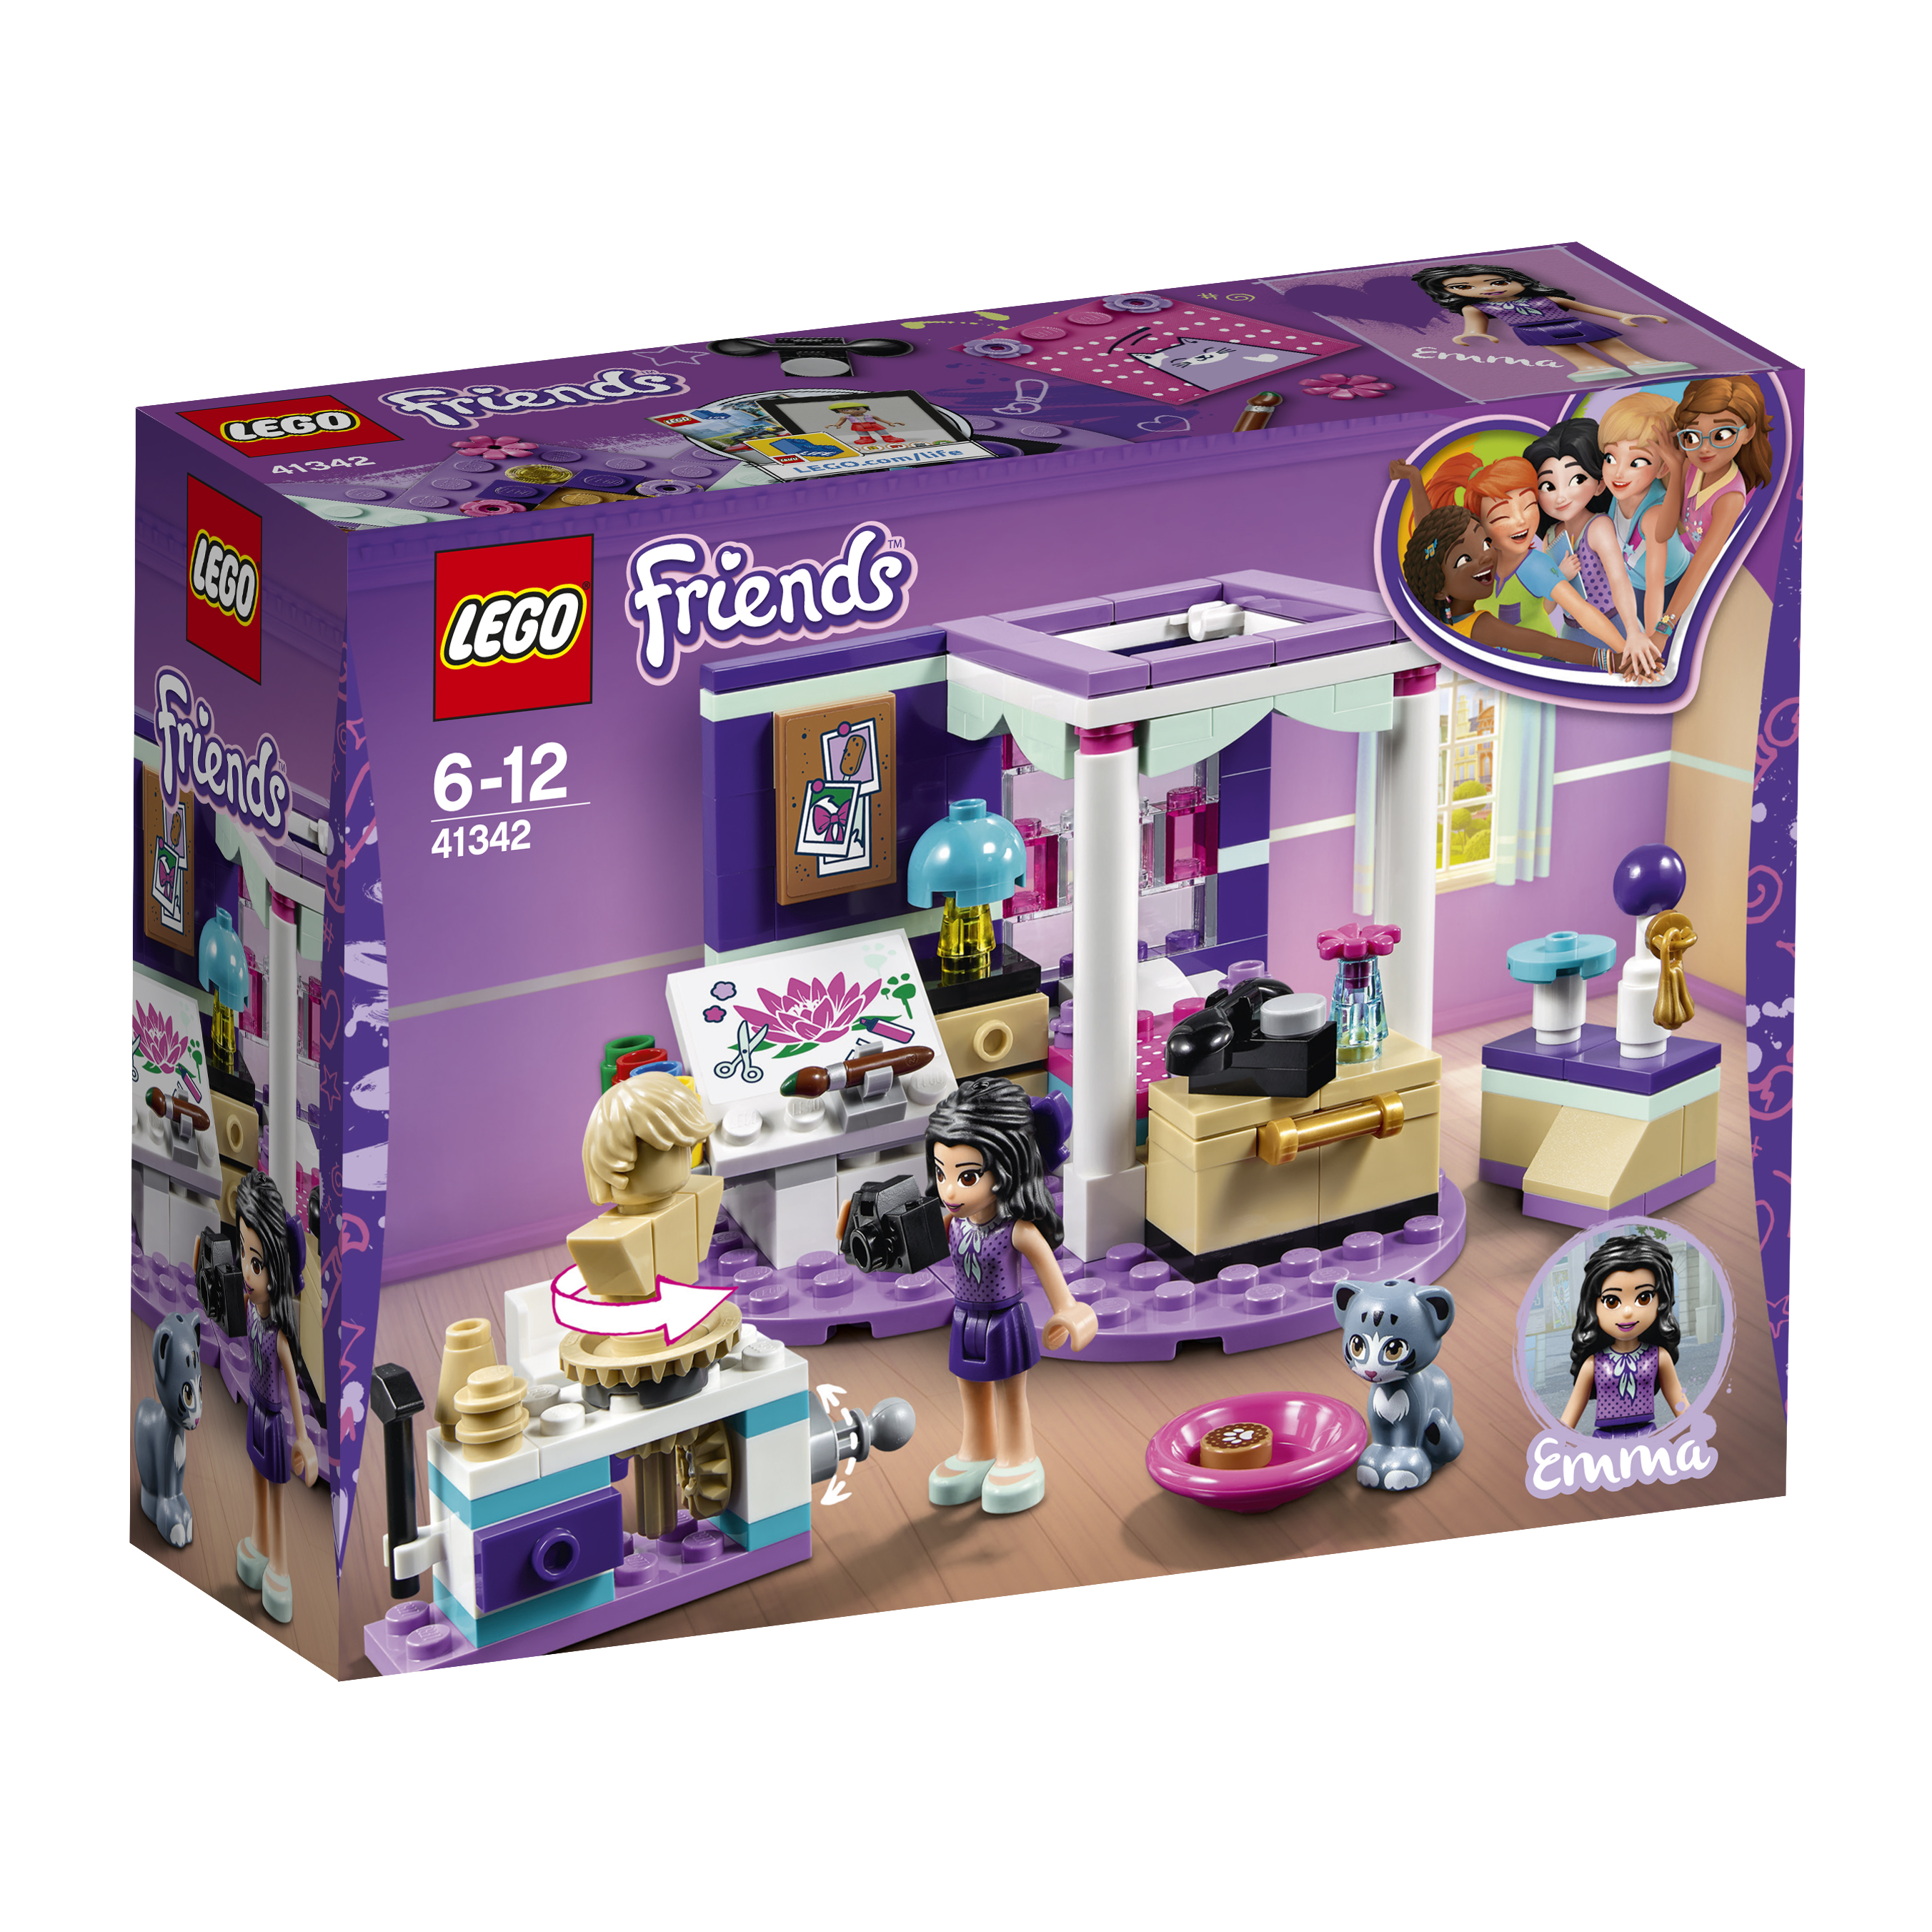 LEGO LEGO Конструктор LEGO Friends 41342 Комната Эммы конструктор lego friends огород 561507